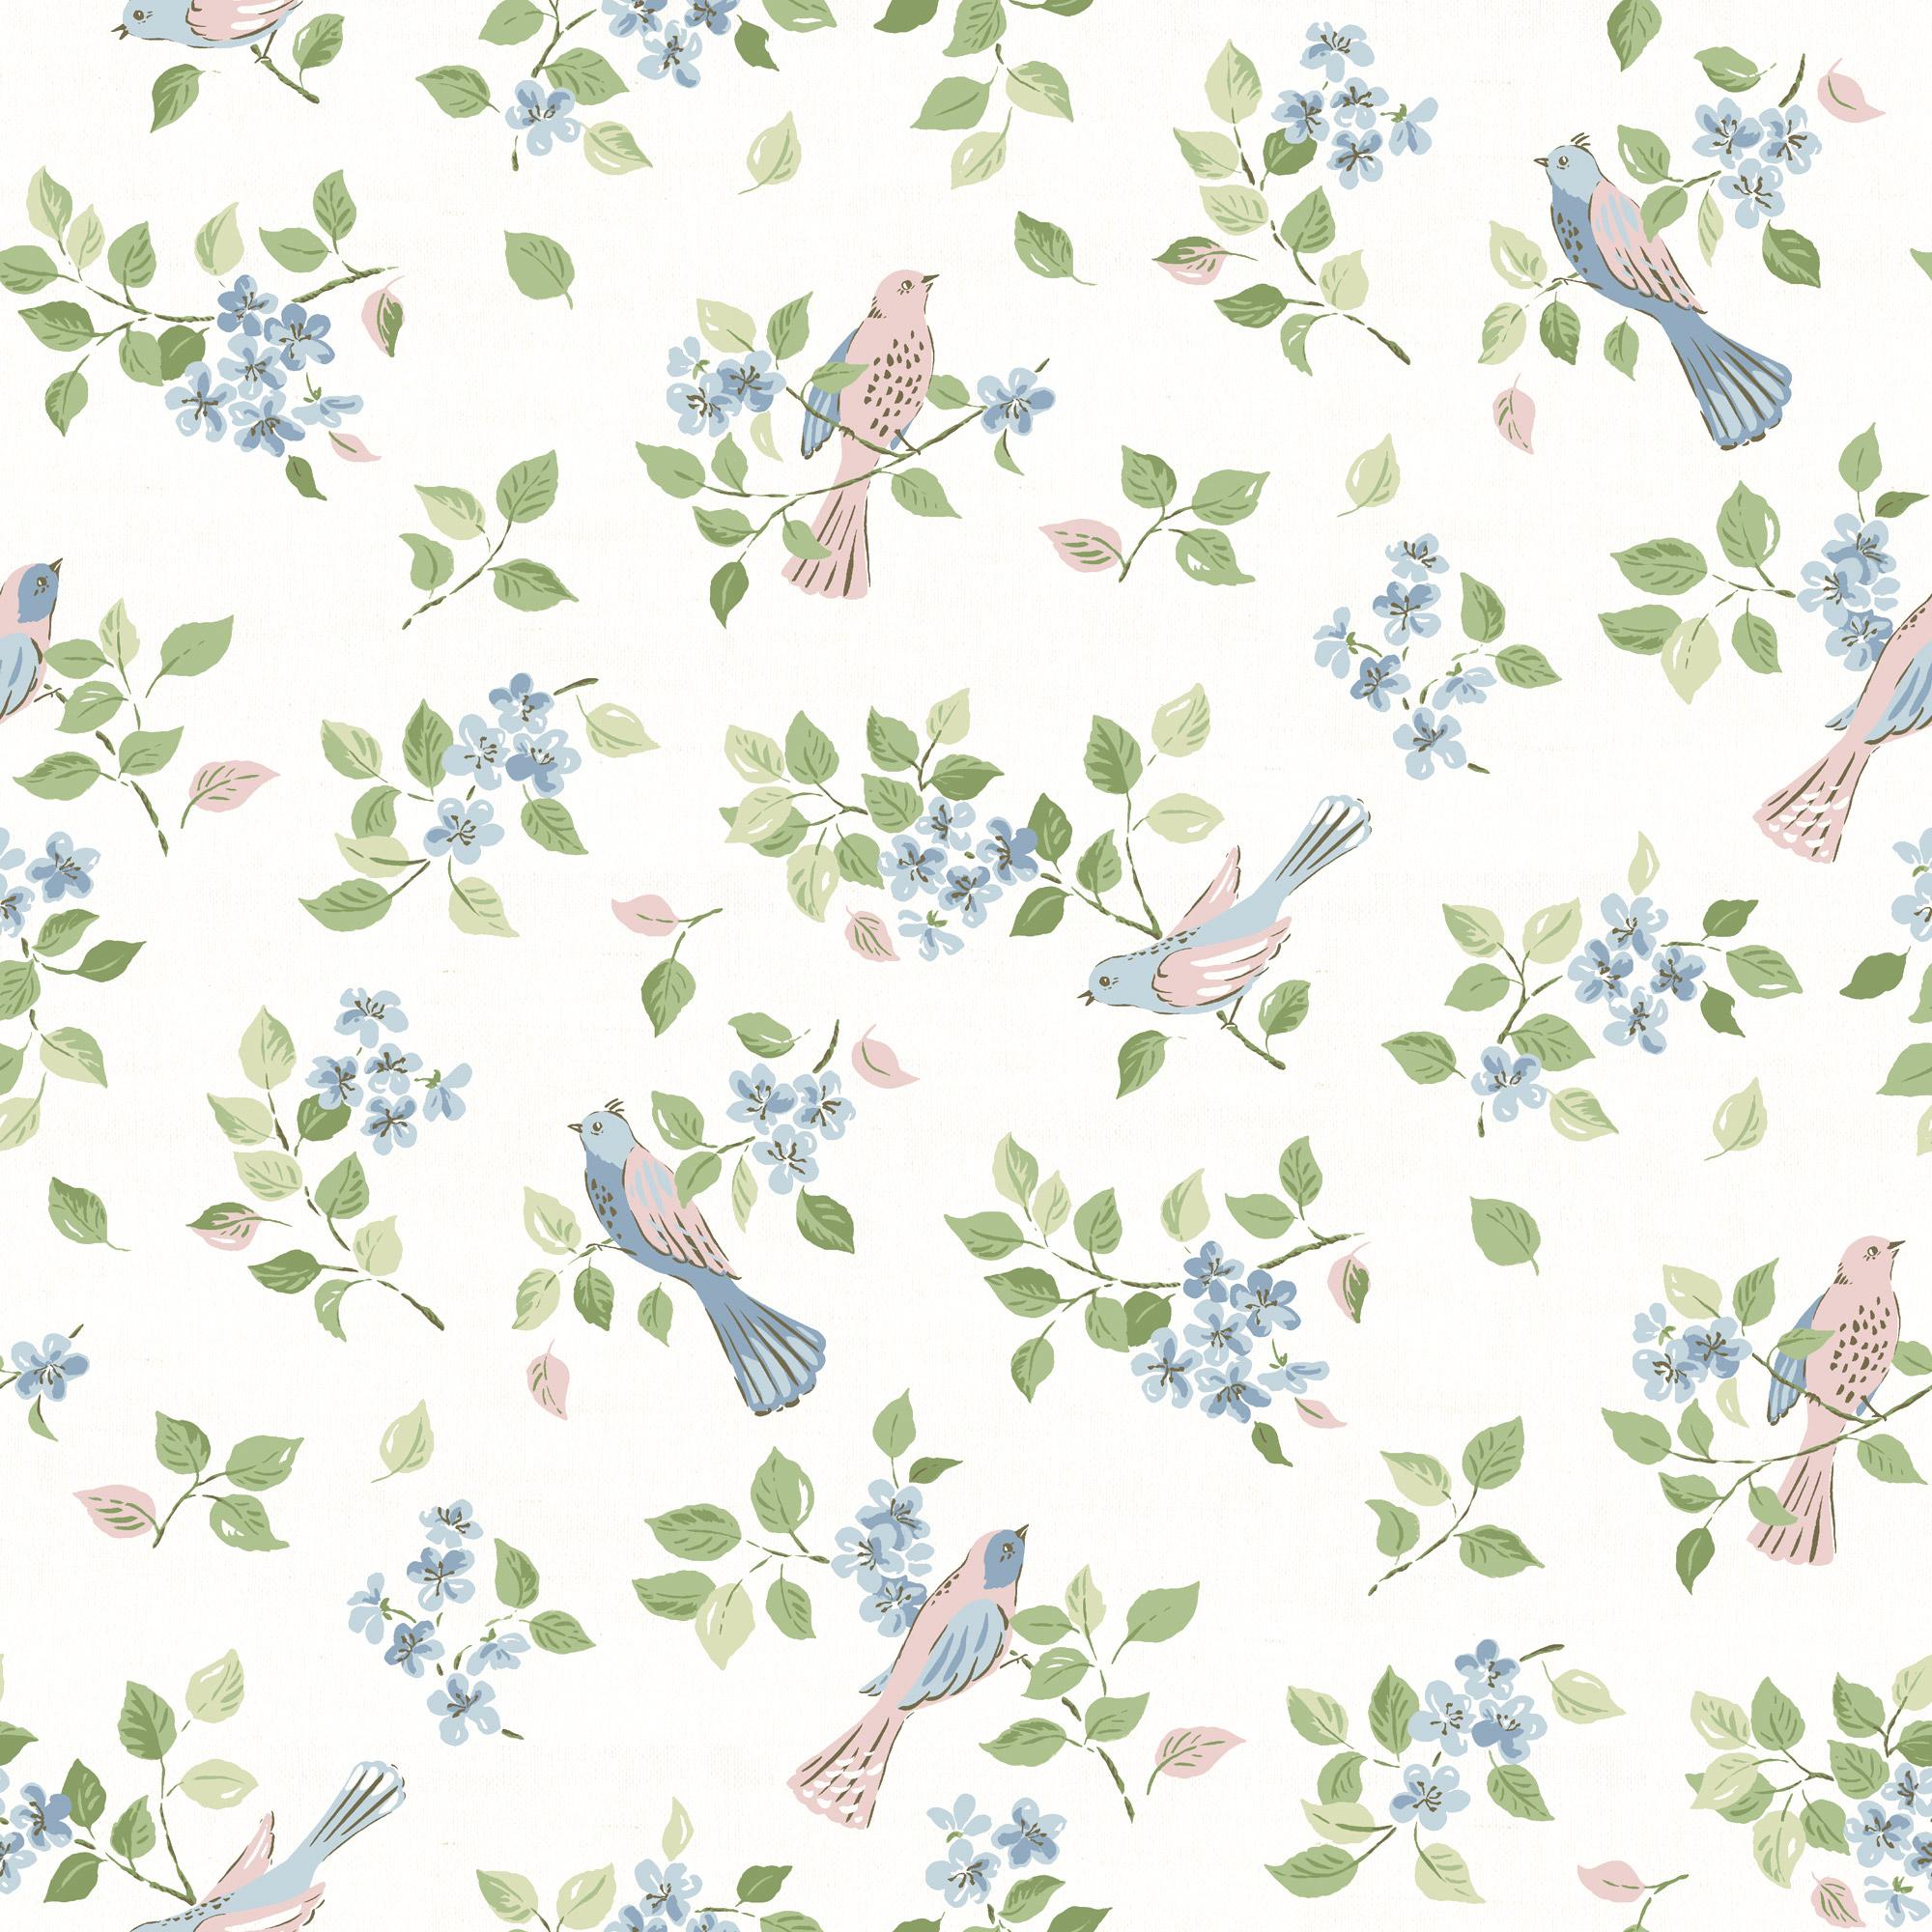 Birds in Blossom Sky